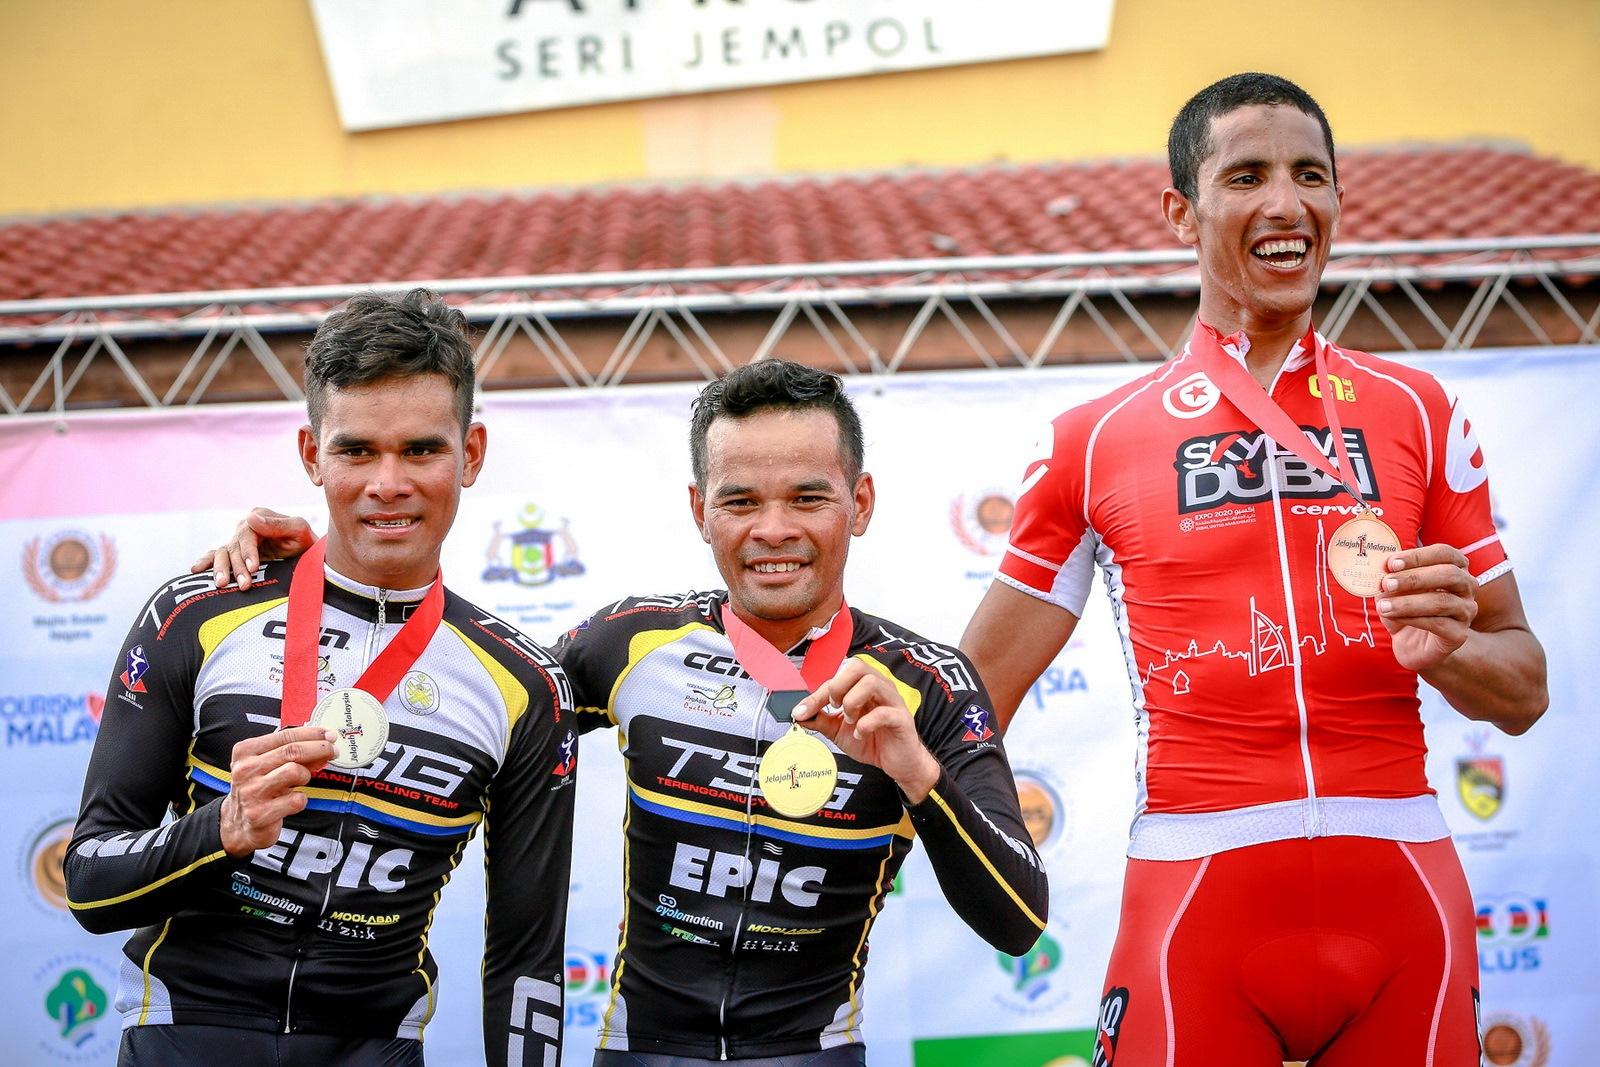 Jelajah Malaysia 2014 - From left - Mohd Hariff, Mohd Zamri and Rafaa Chtioui